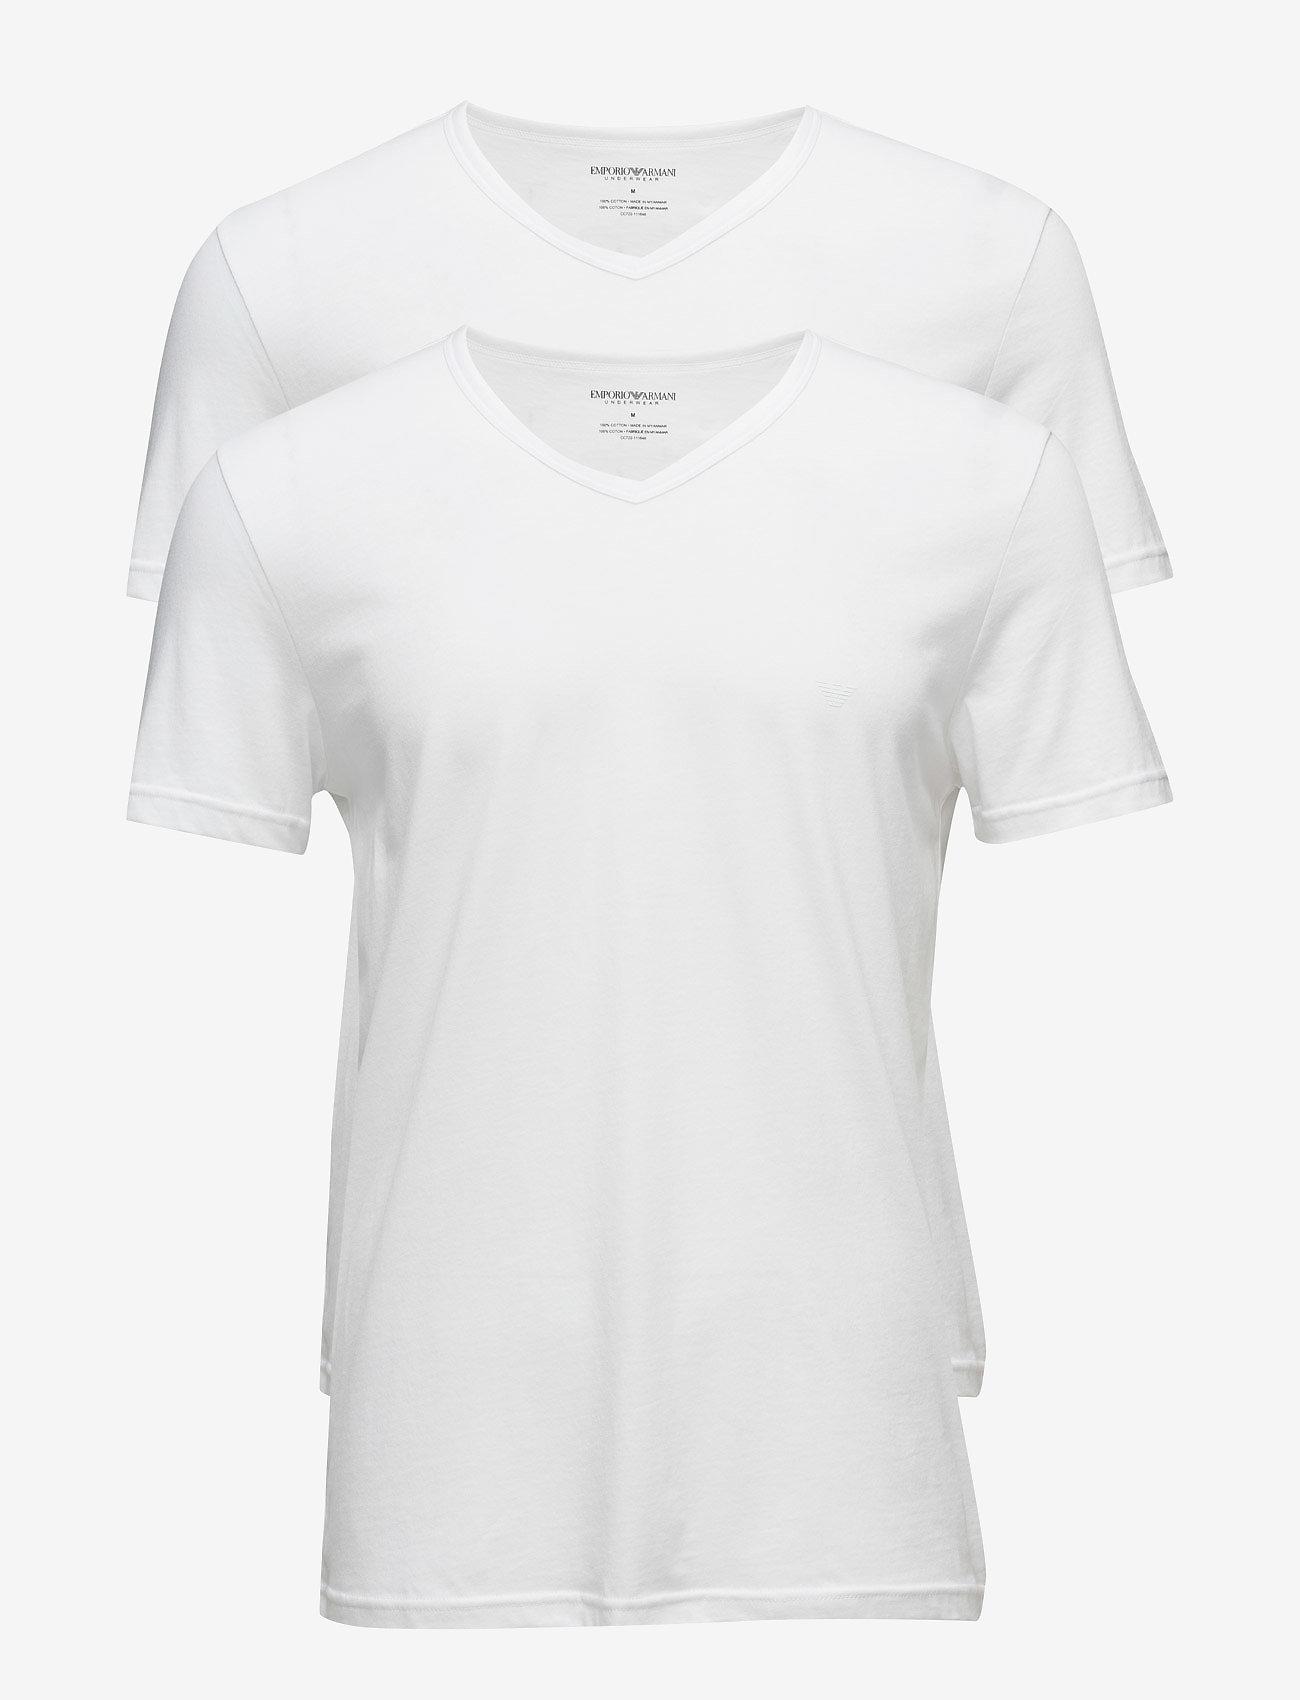 Emporio Armani - MENS KNIT 2PACK TSH - multipack - bianco/bianco - 0